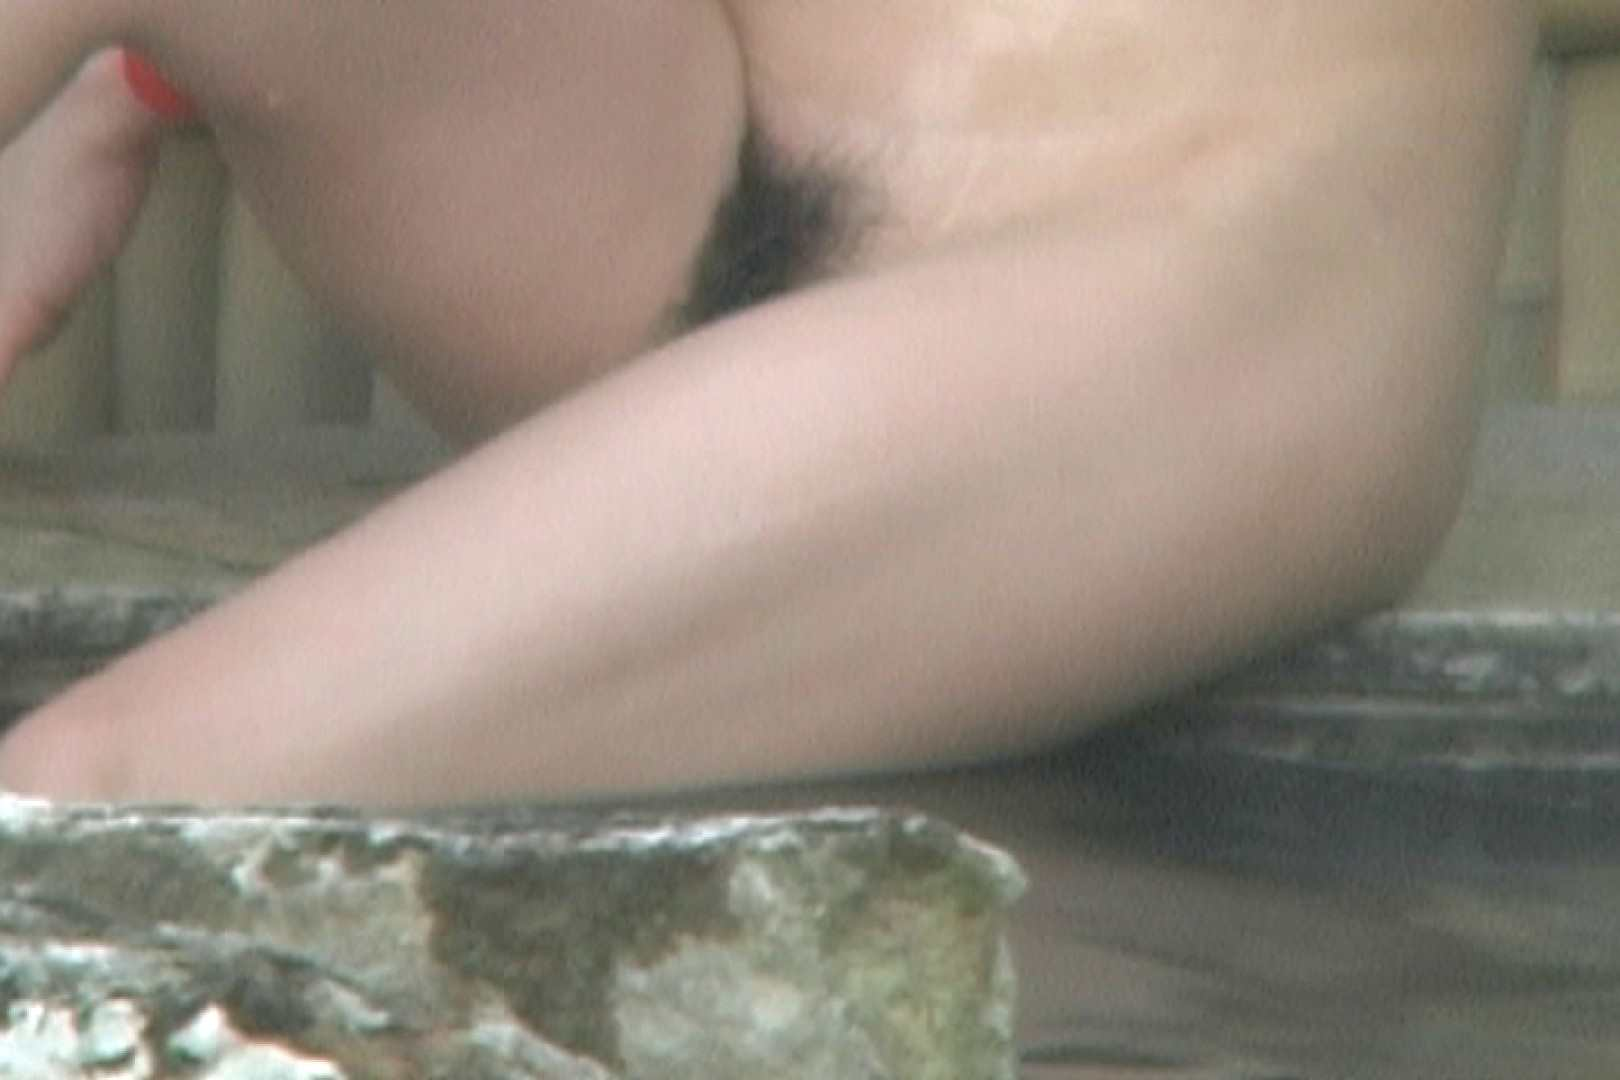 Aquaな露天風呂Vol.594 盗撮師作品 | 露天風呂突入  79pic 58